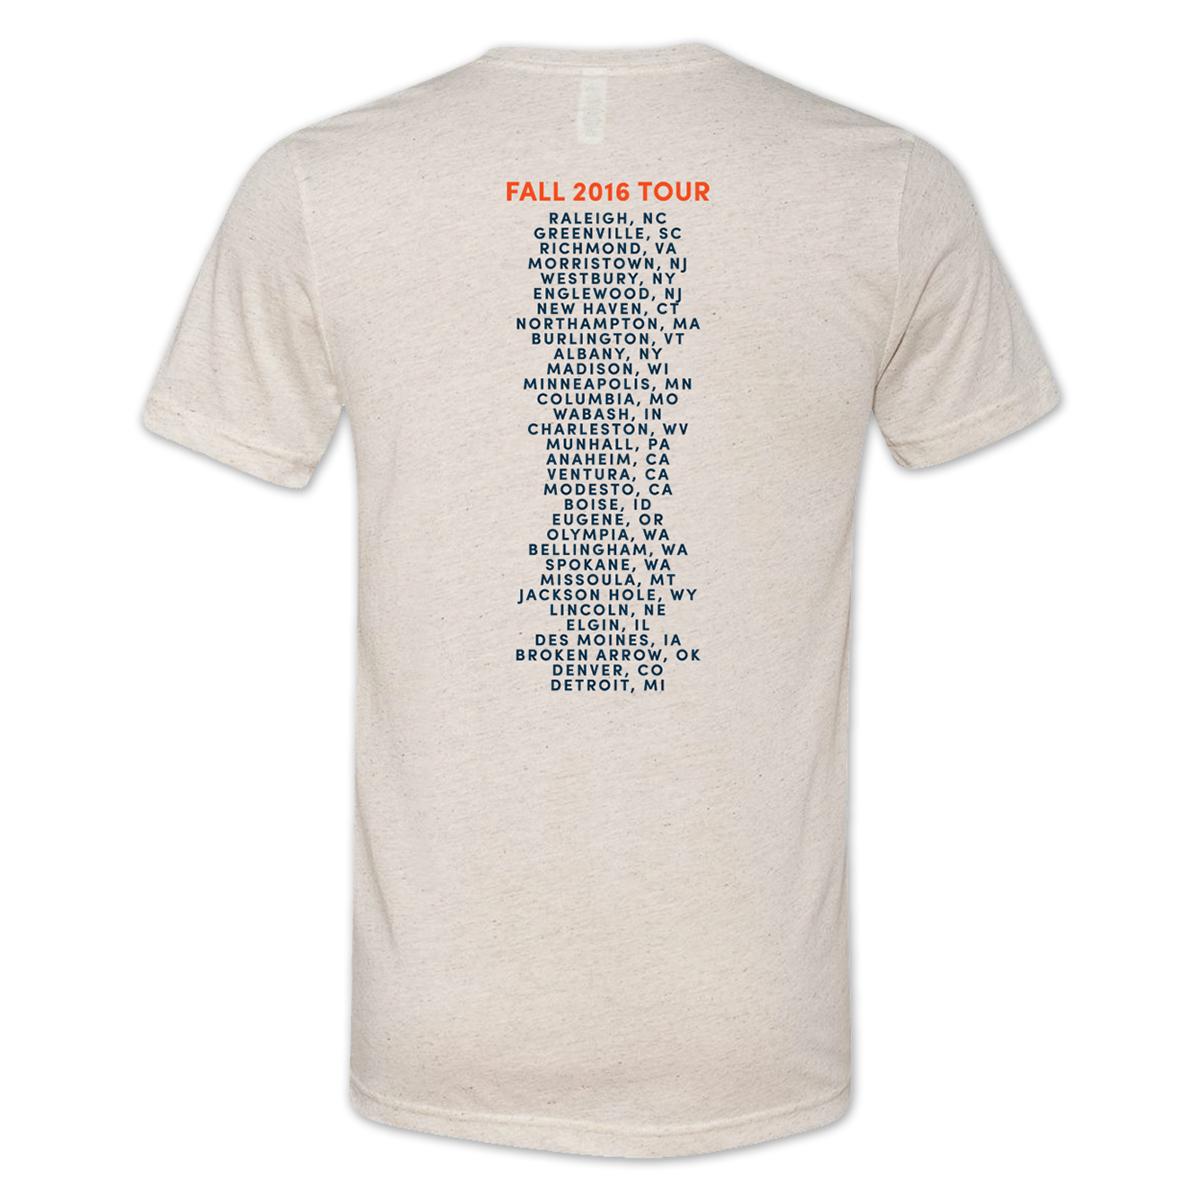 Ben Folds Fall Tour 2016 T